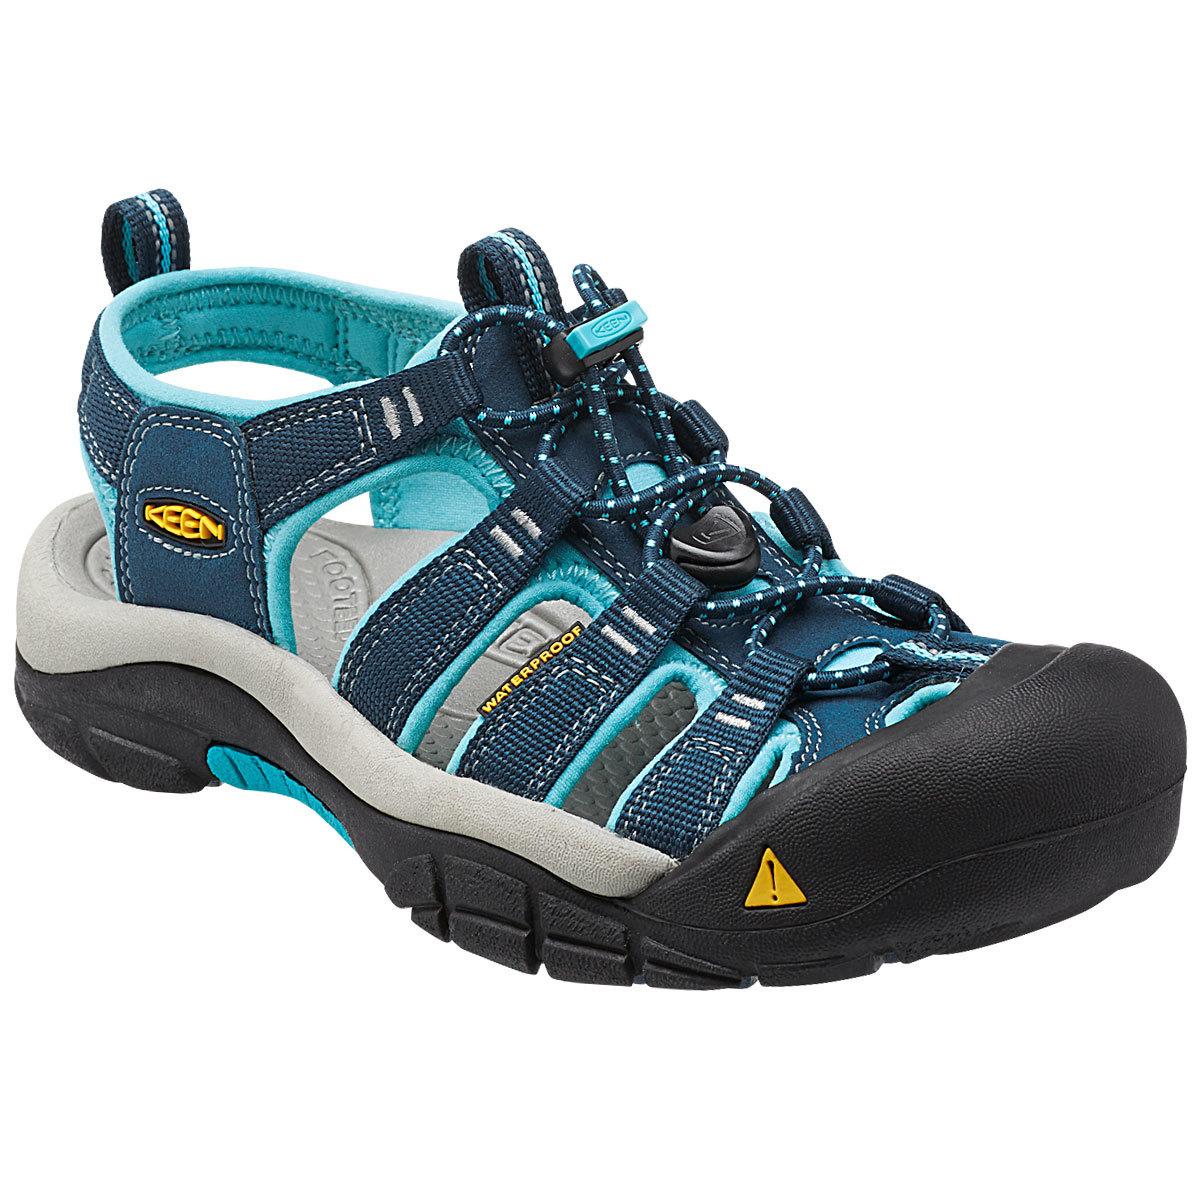 Keen Women's Newport H2-W Sandals, Poseidon/capri - Blue, 10